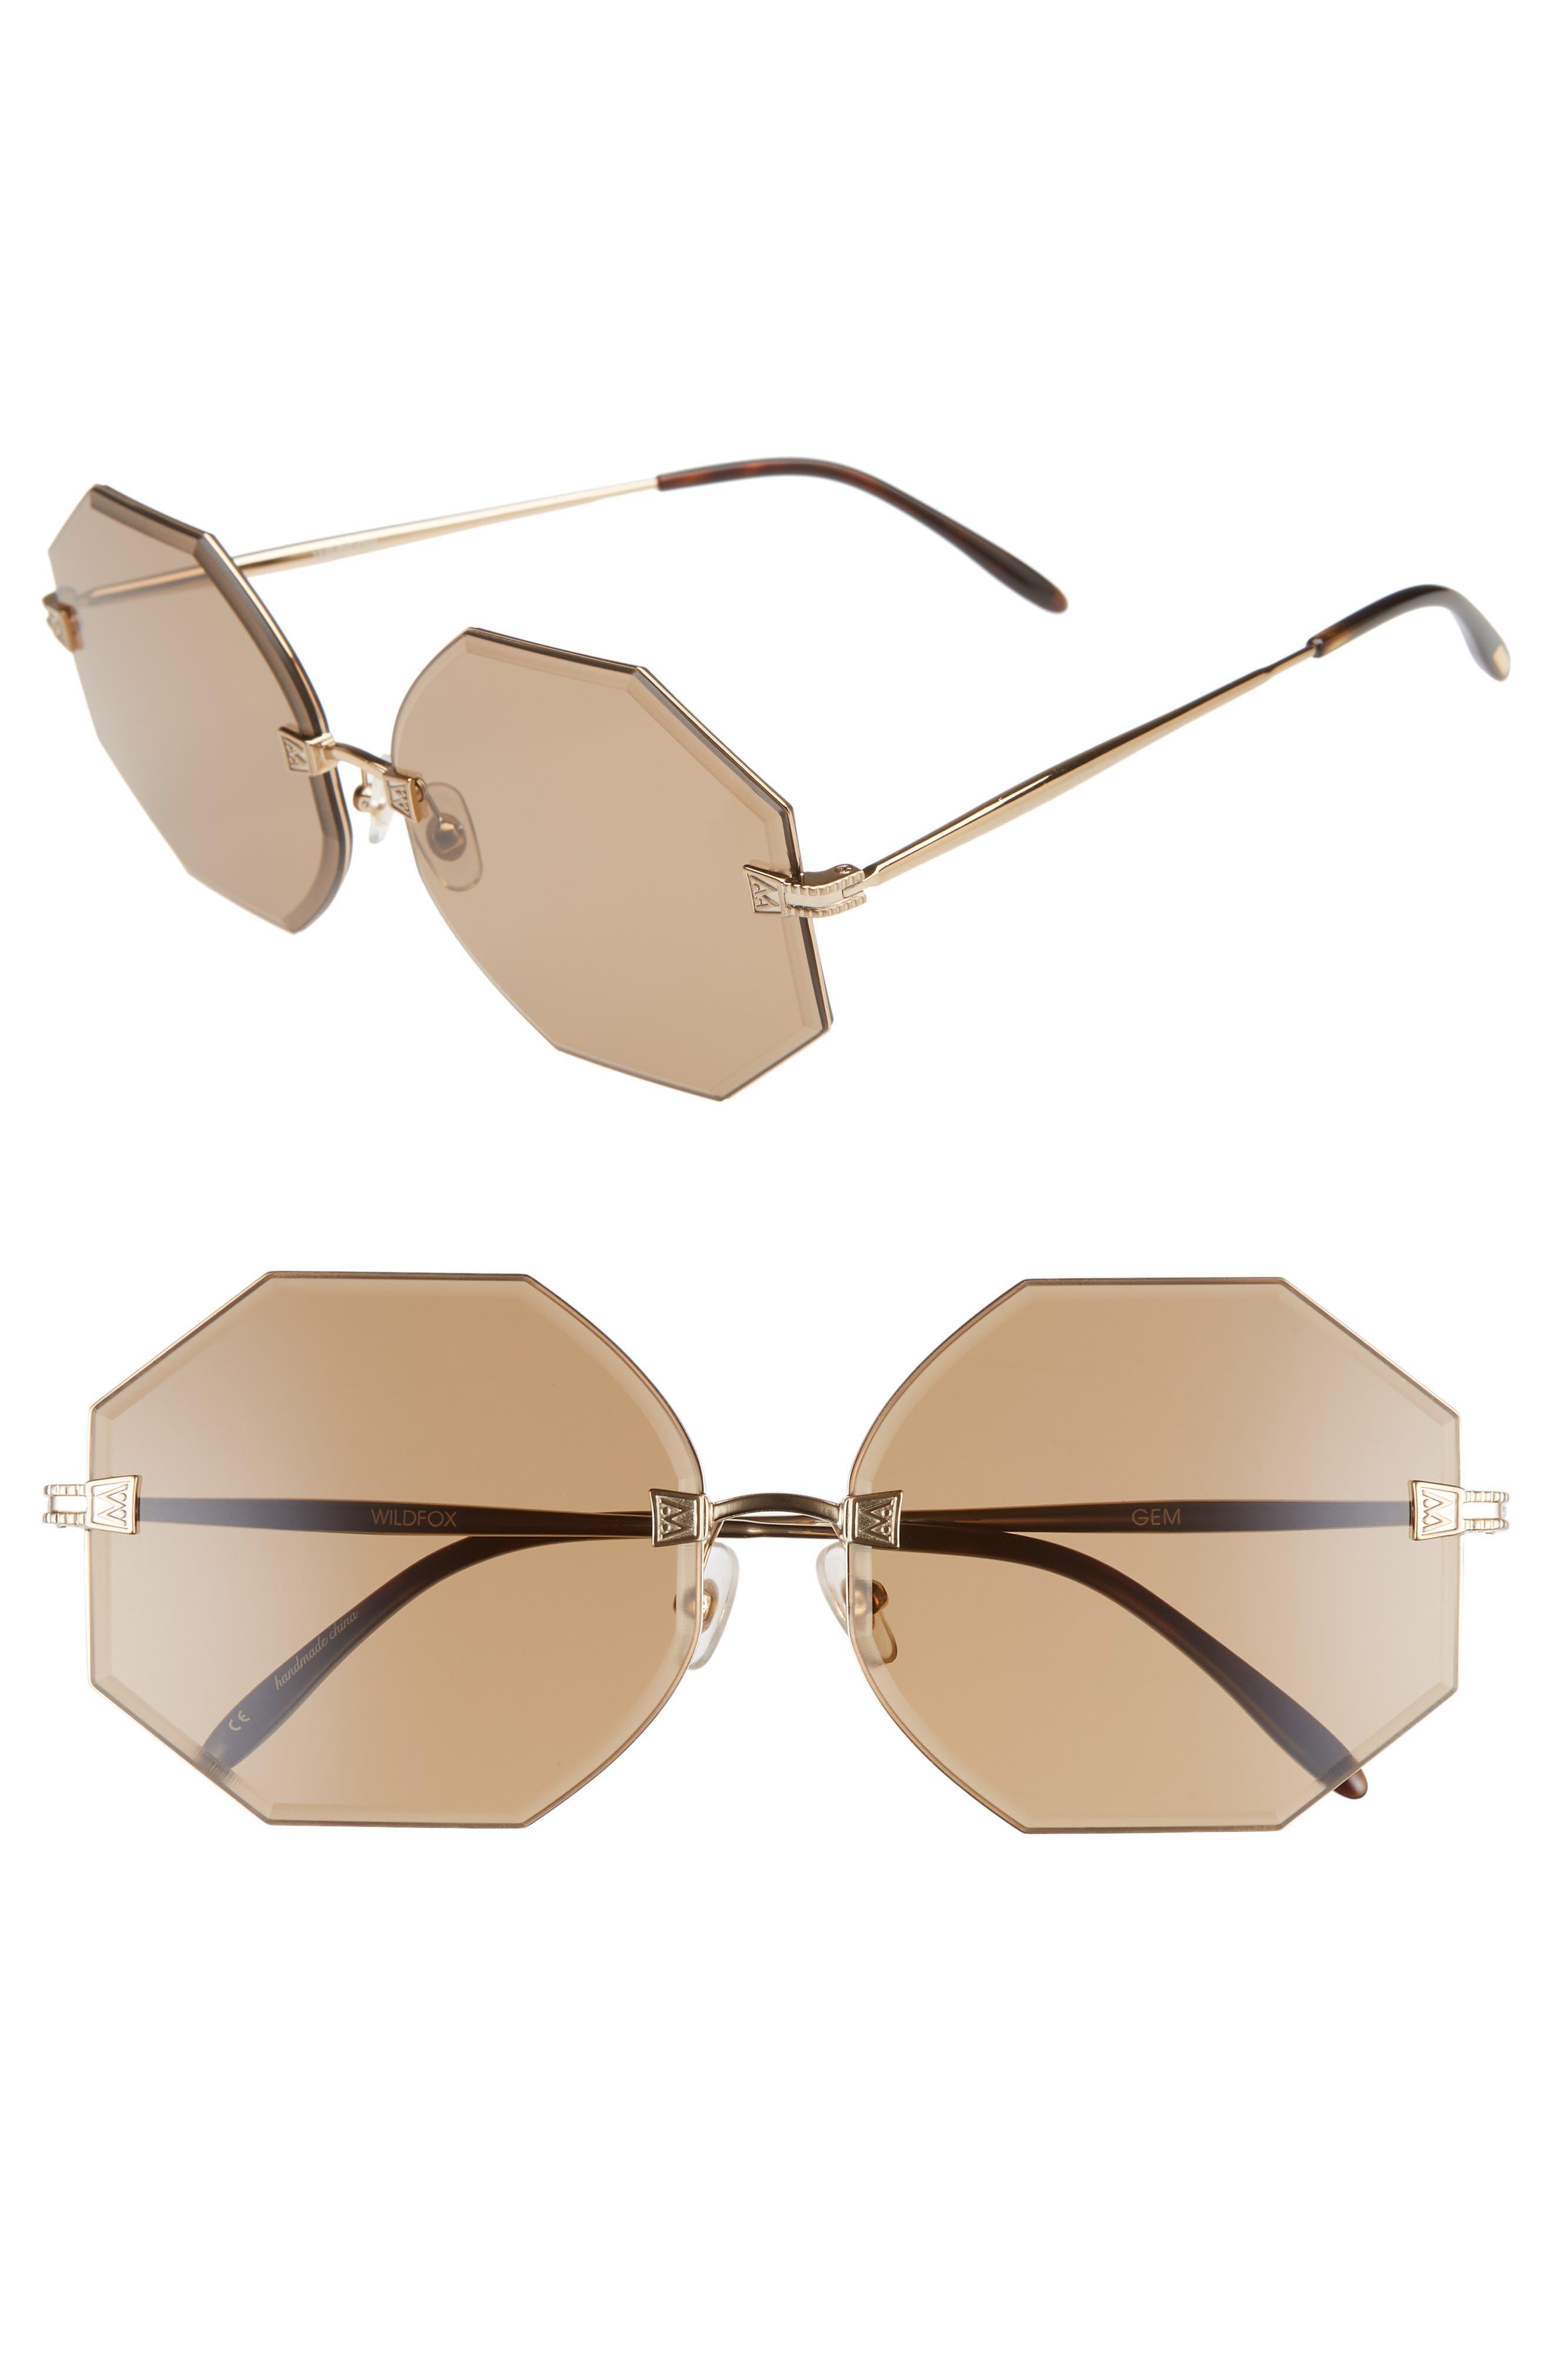 Gem 64mm Oversize Geometric Sunglasses,                             Main thumbnail 1, color,                             ANTIQUE GOLD/ BROWN SOLID